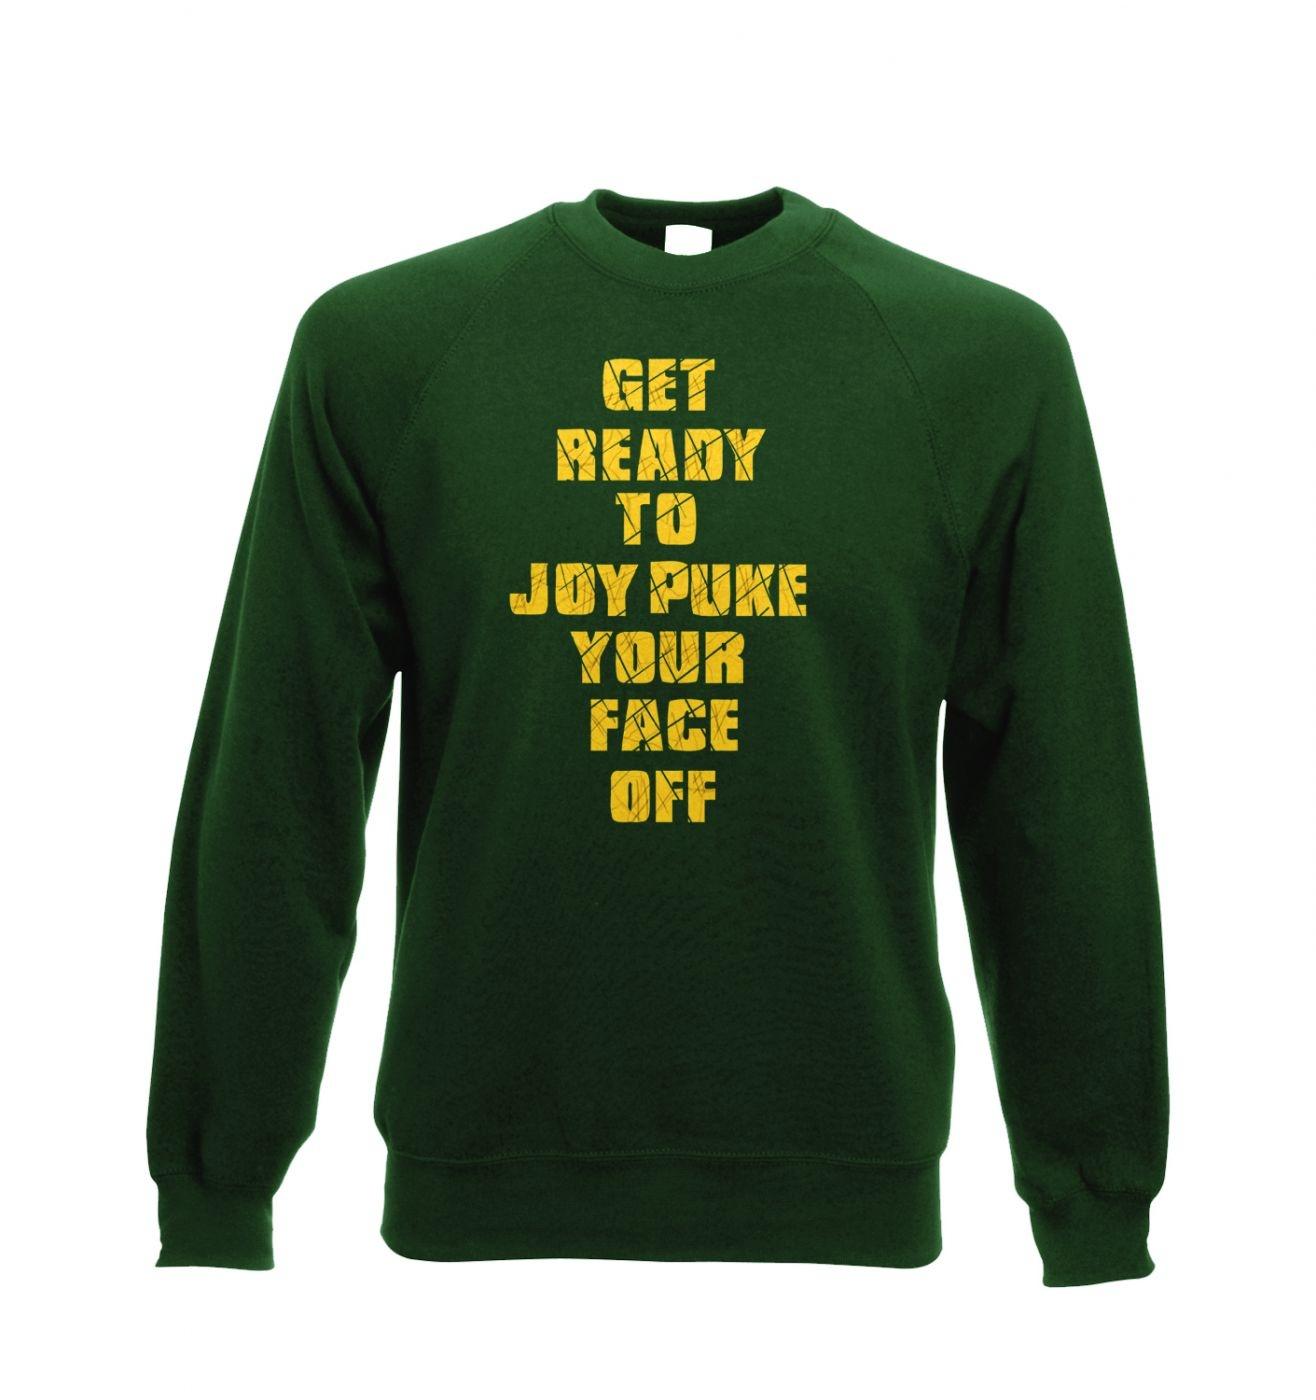 Get Ready To Joy Puke Your Face Off crewneck sweatshirt